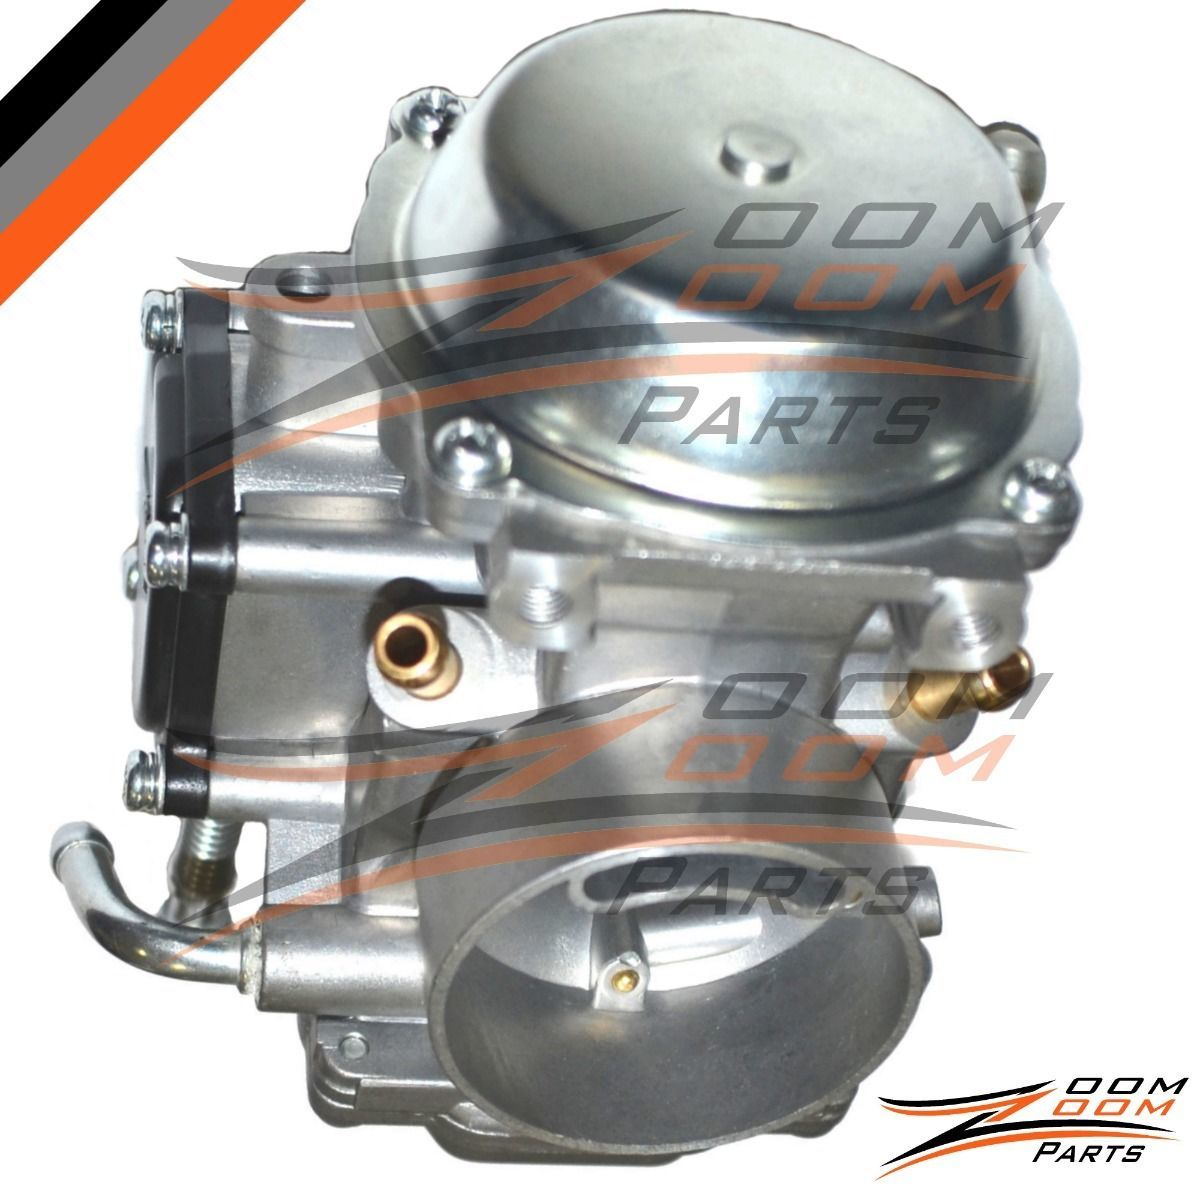 Polaris Sportsman 335 Carburetor 1999-2000 99-00 Carb